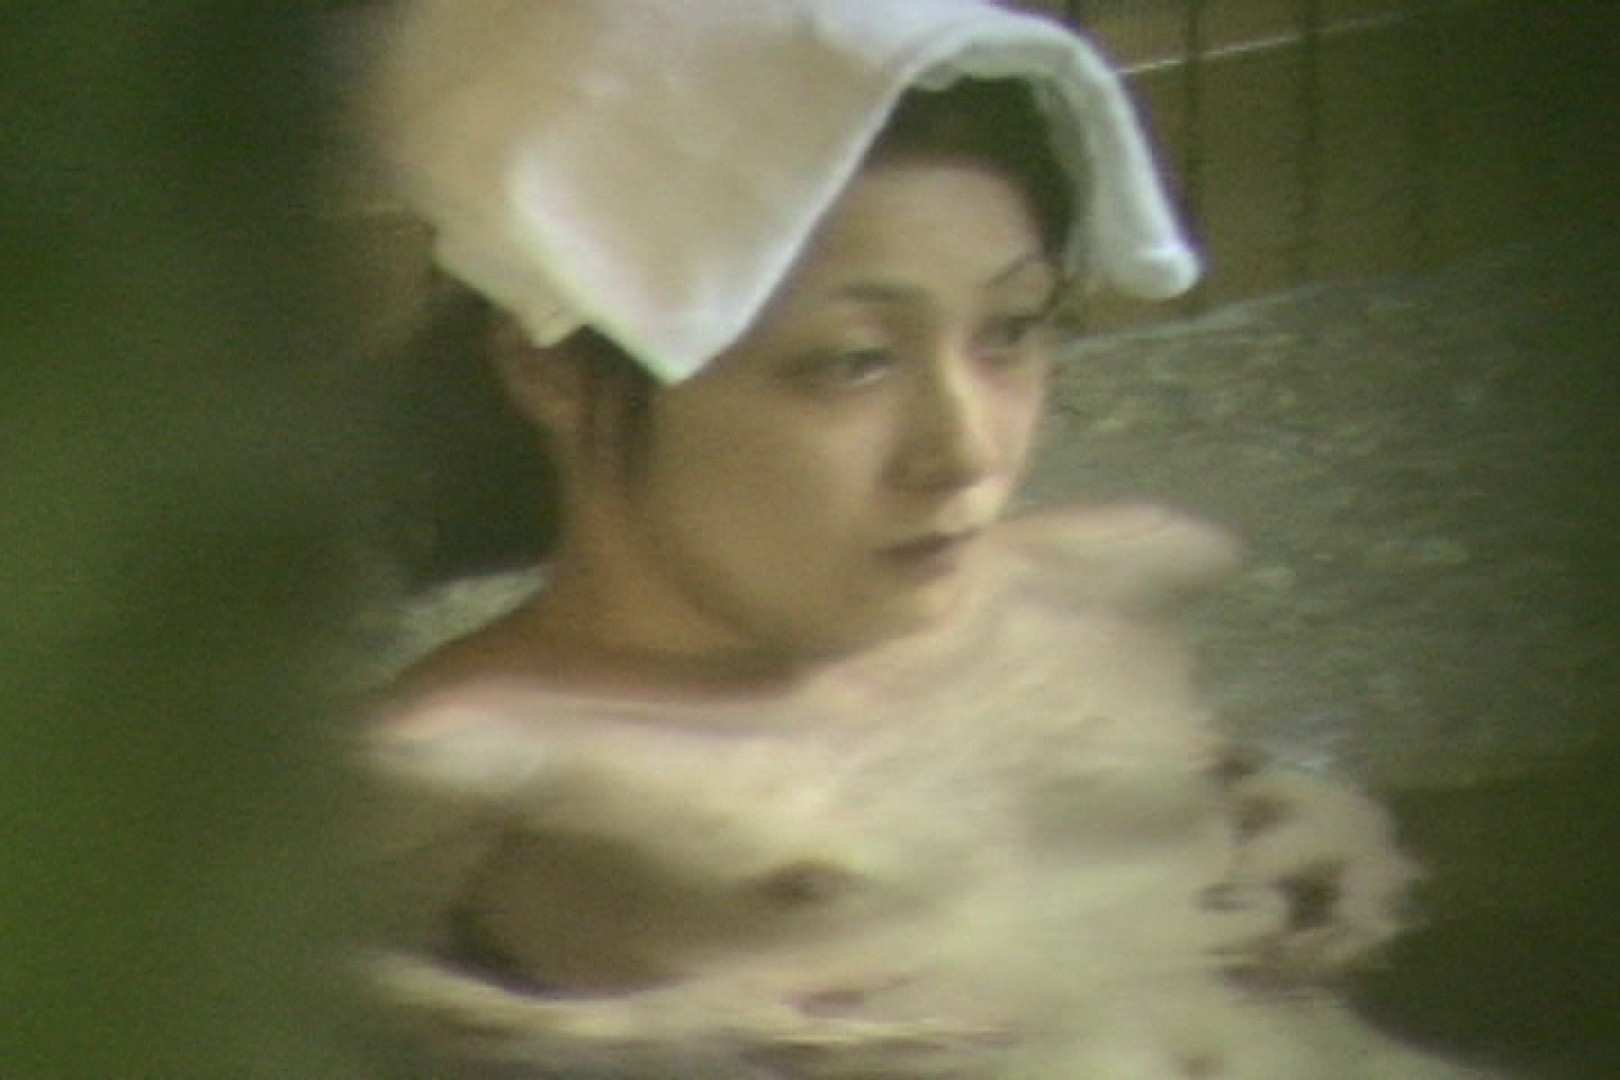 Aquaな露天風呂Vol.701 露天 すけべAV動画紹介 89連発 39